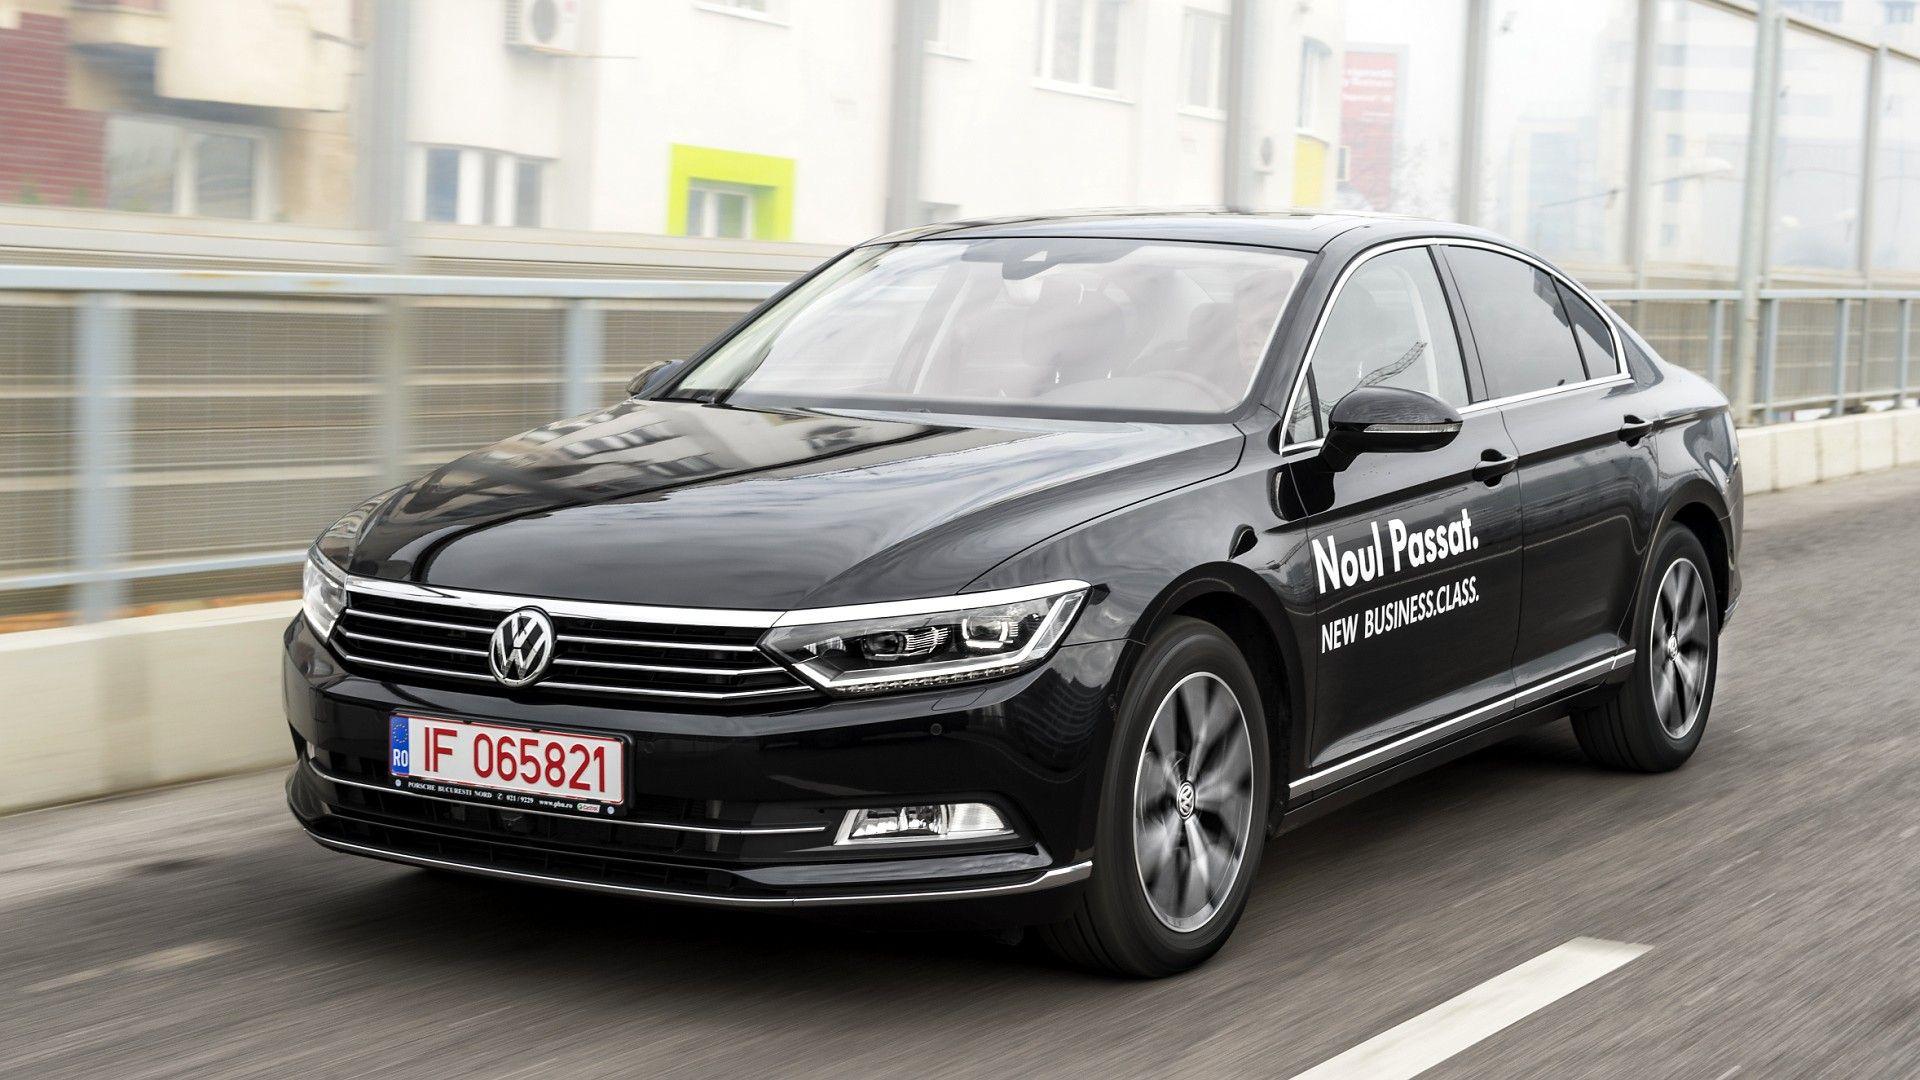 2015 volkswagen passat review http www autoevolution com reviews